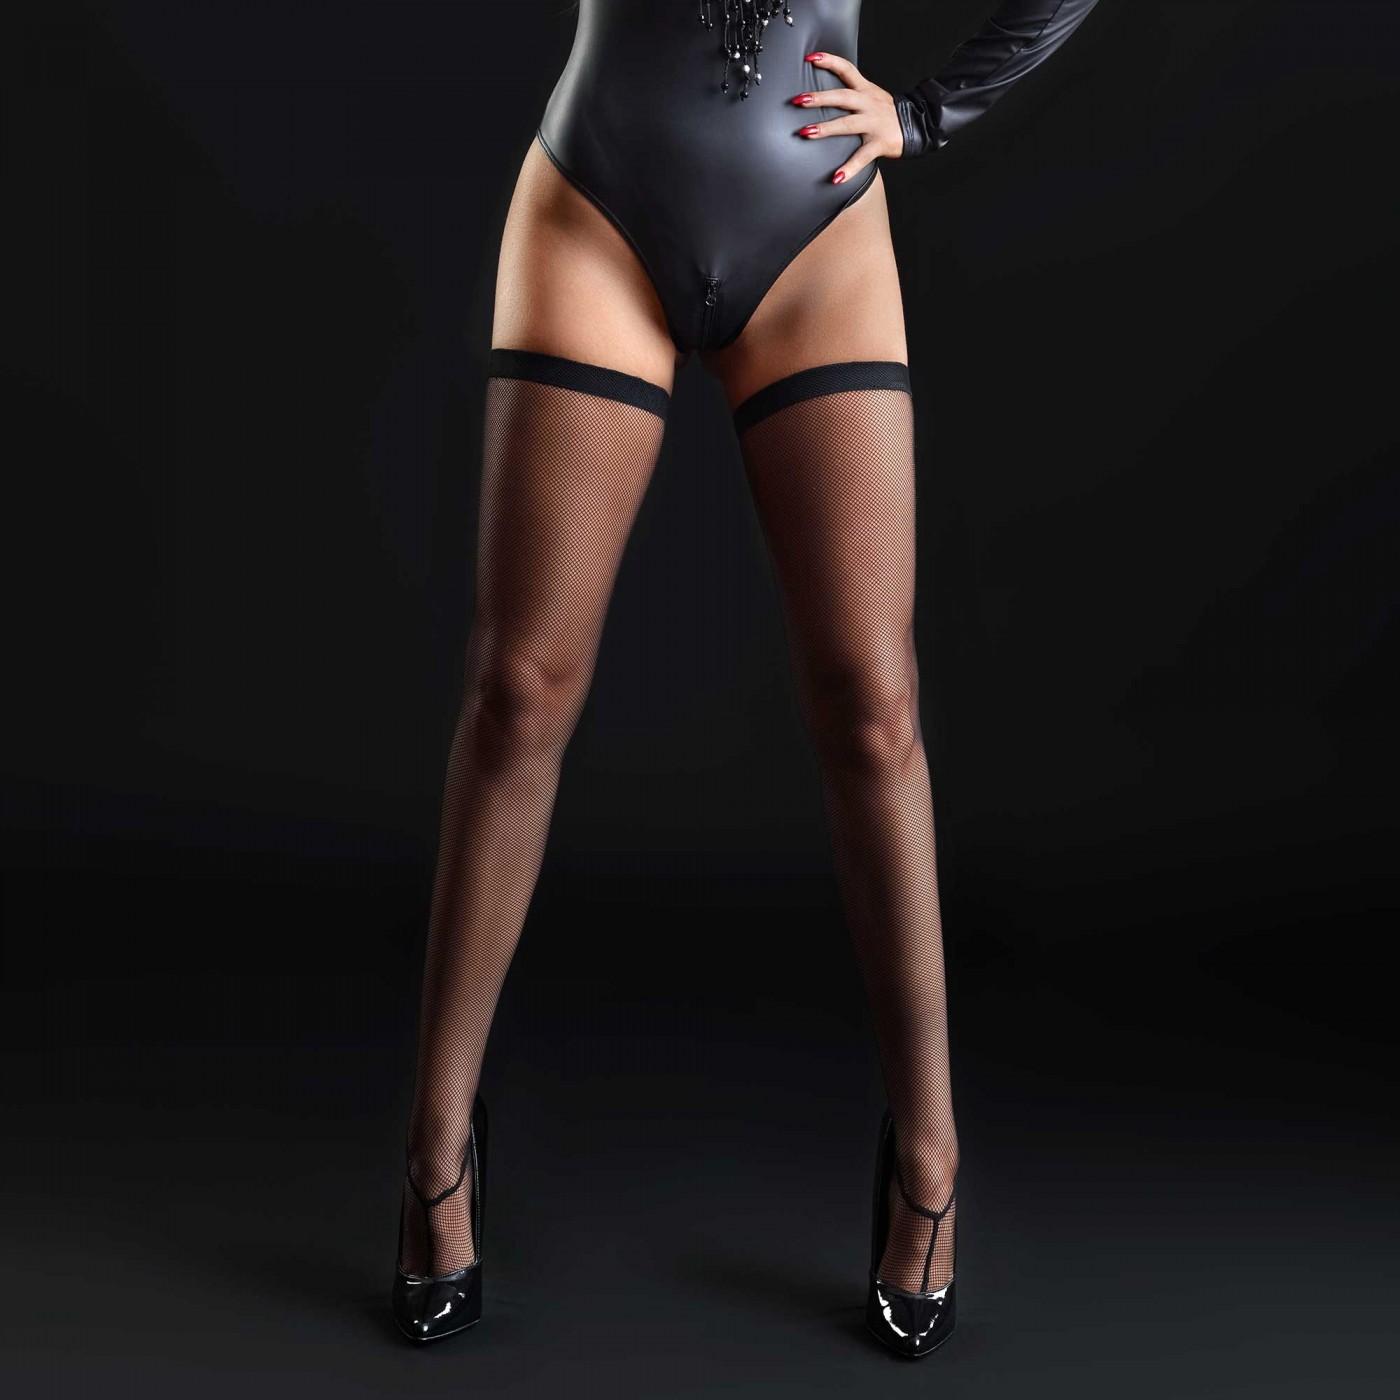 Angie, bas sexy en résille noire - Patrice Catanzaro